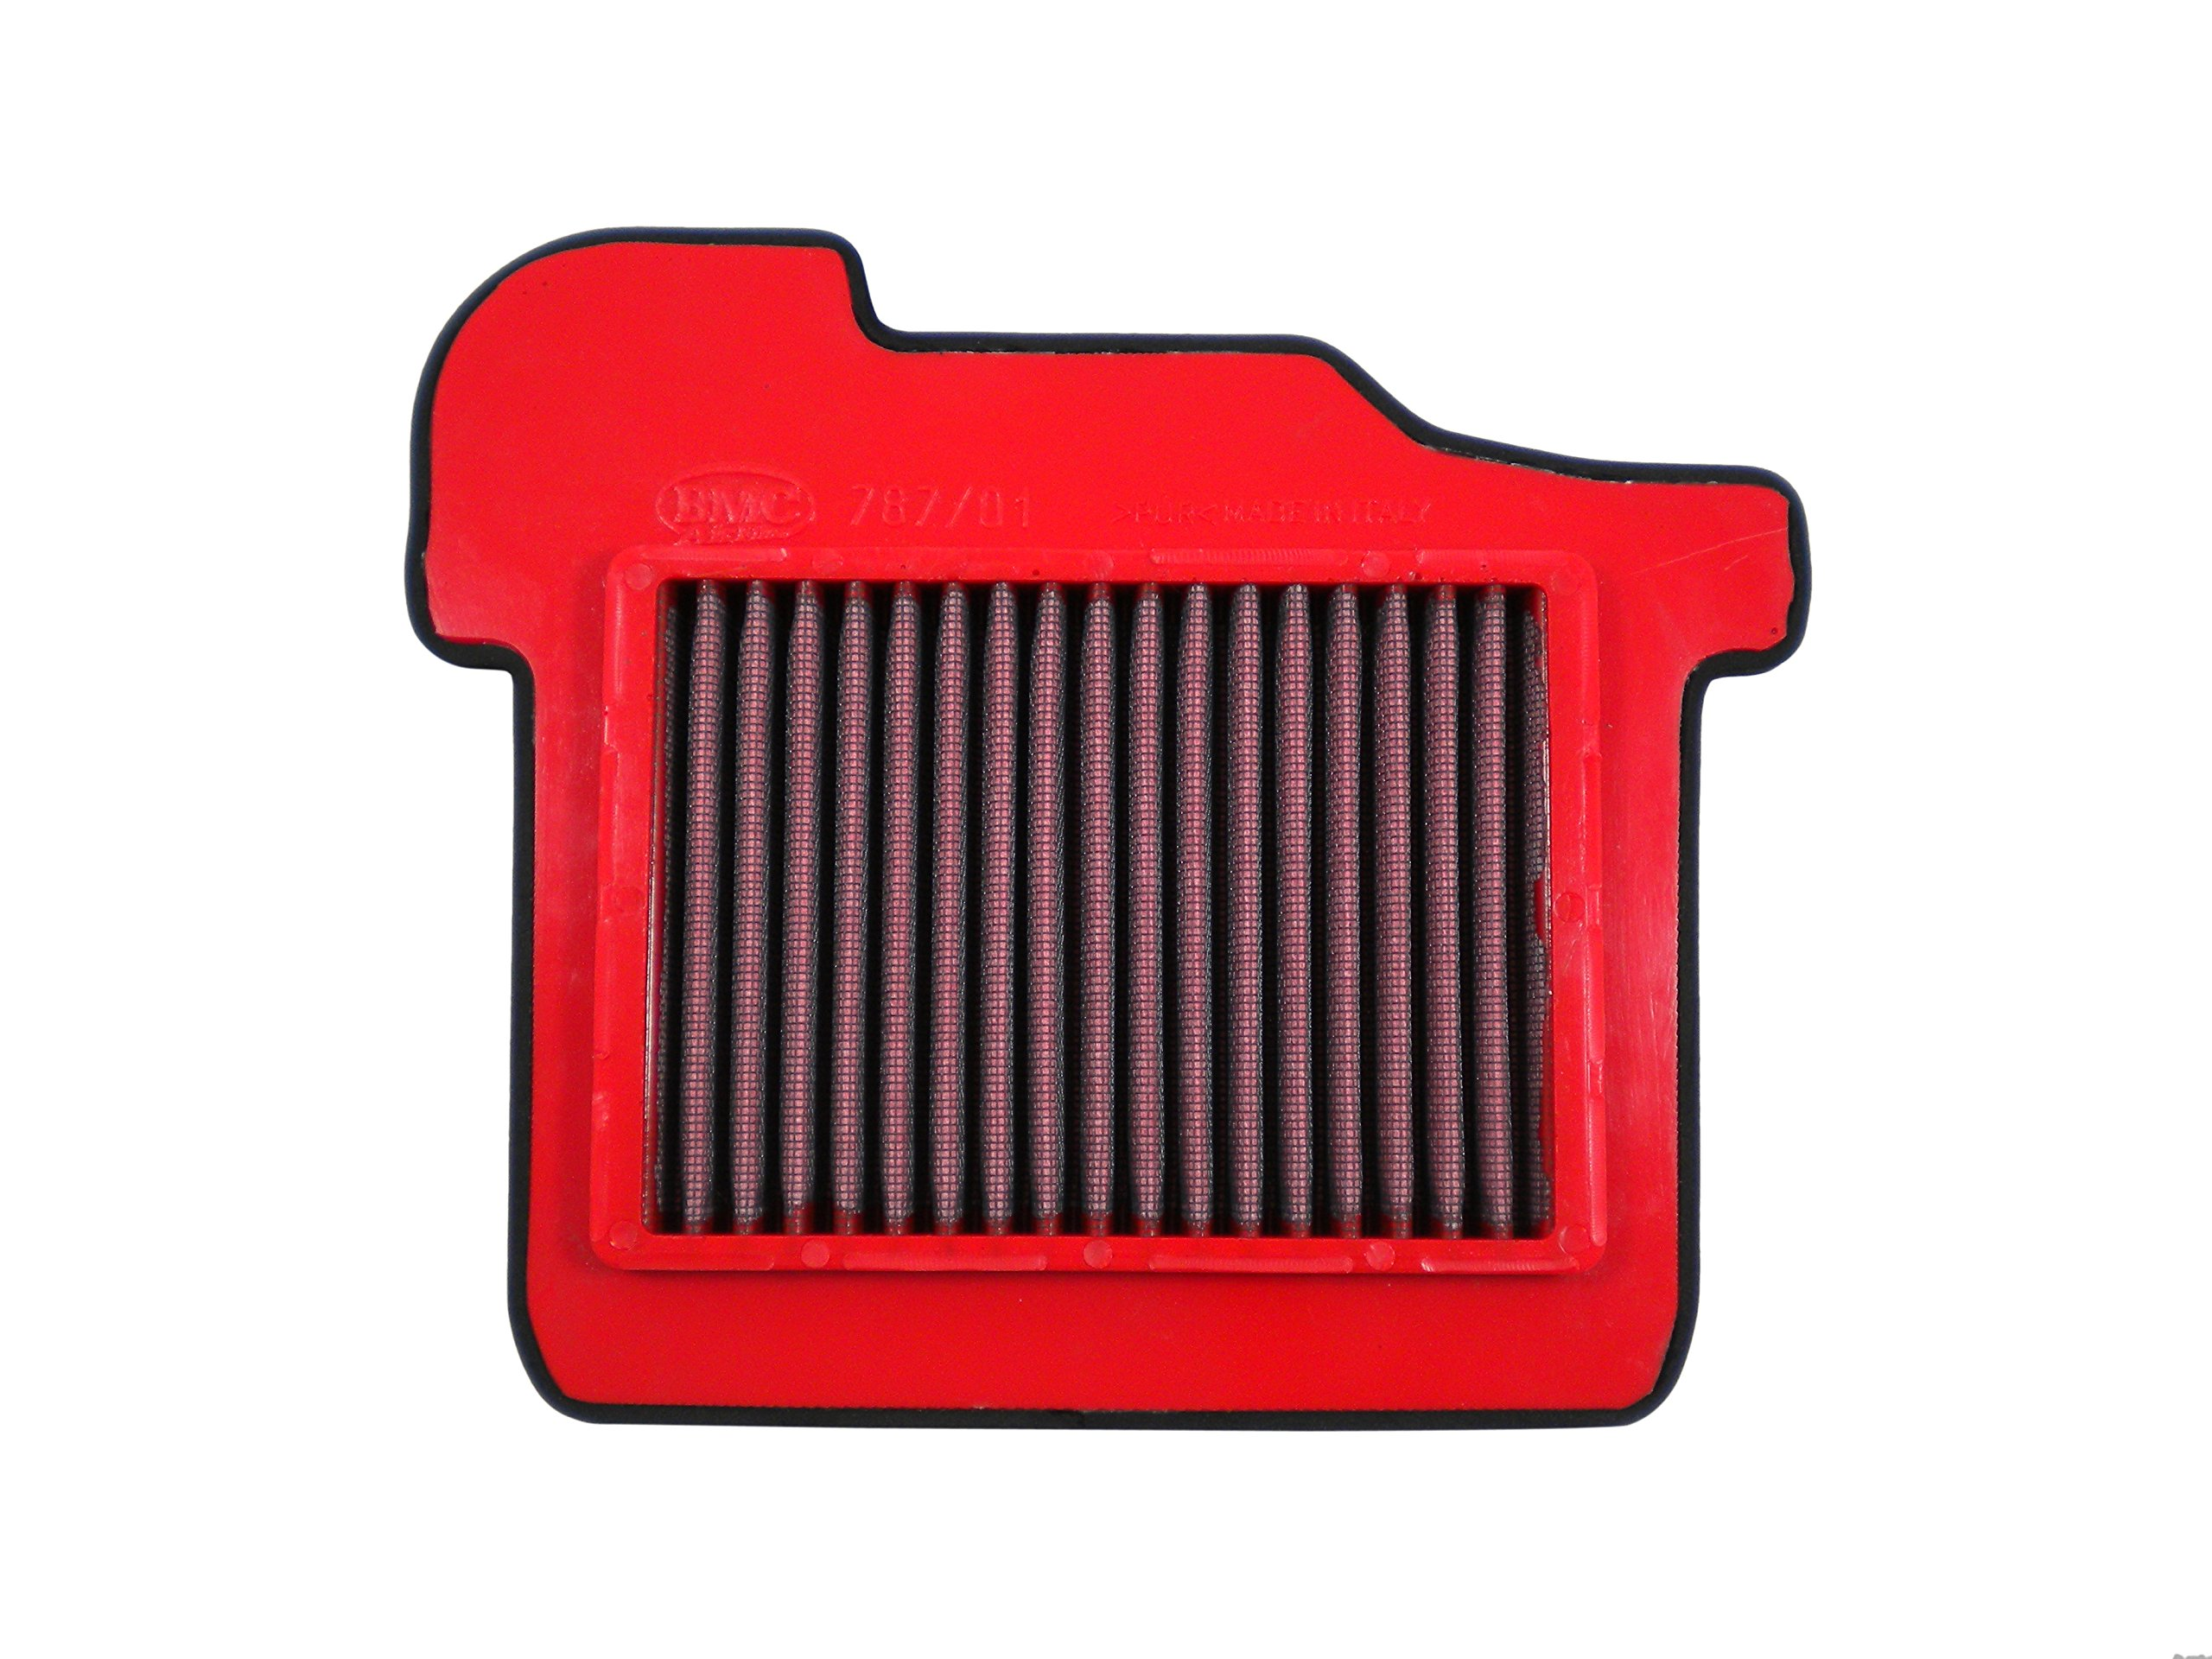 BMC FM787 Sport / 01 Replacement Air Filter, Multi-Colour